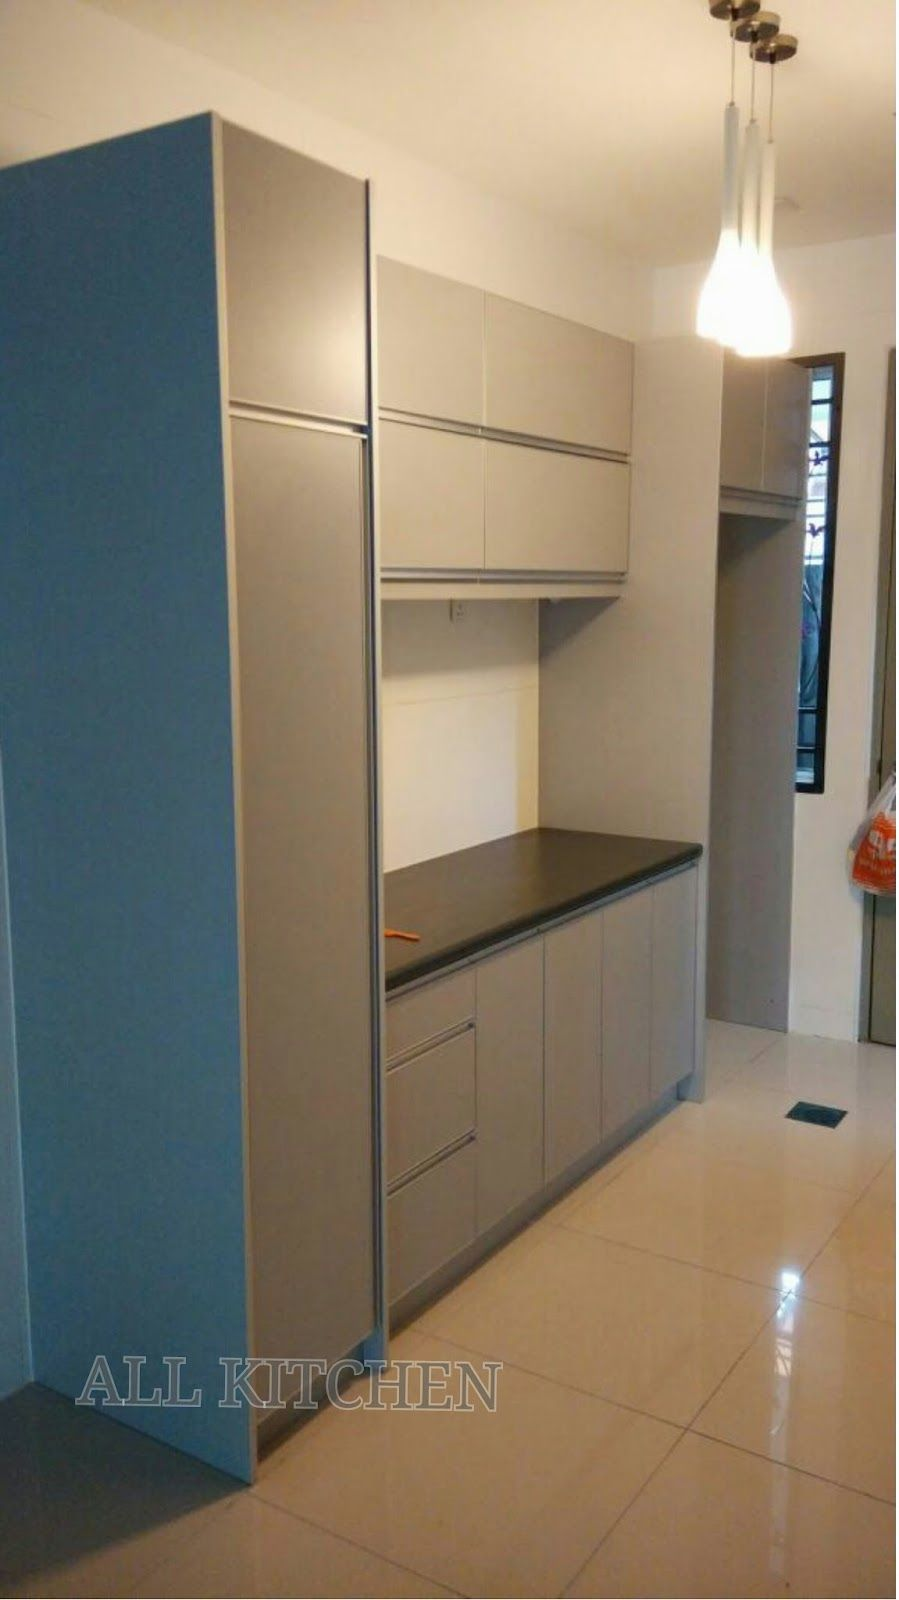 All Kitchen Kabinet Dapur Taman Impian Sutera Yen 30 Shah Alam